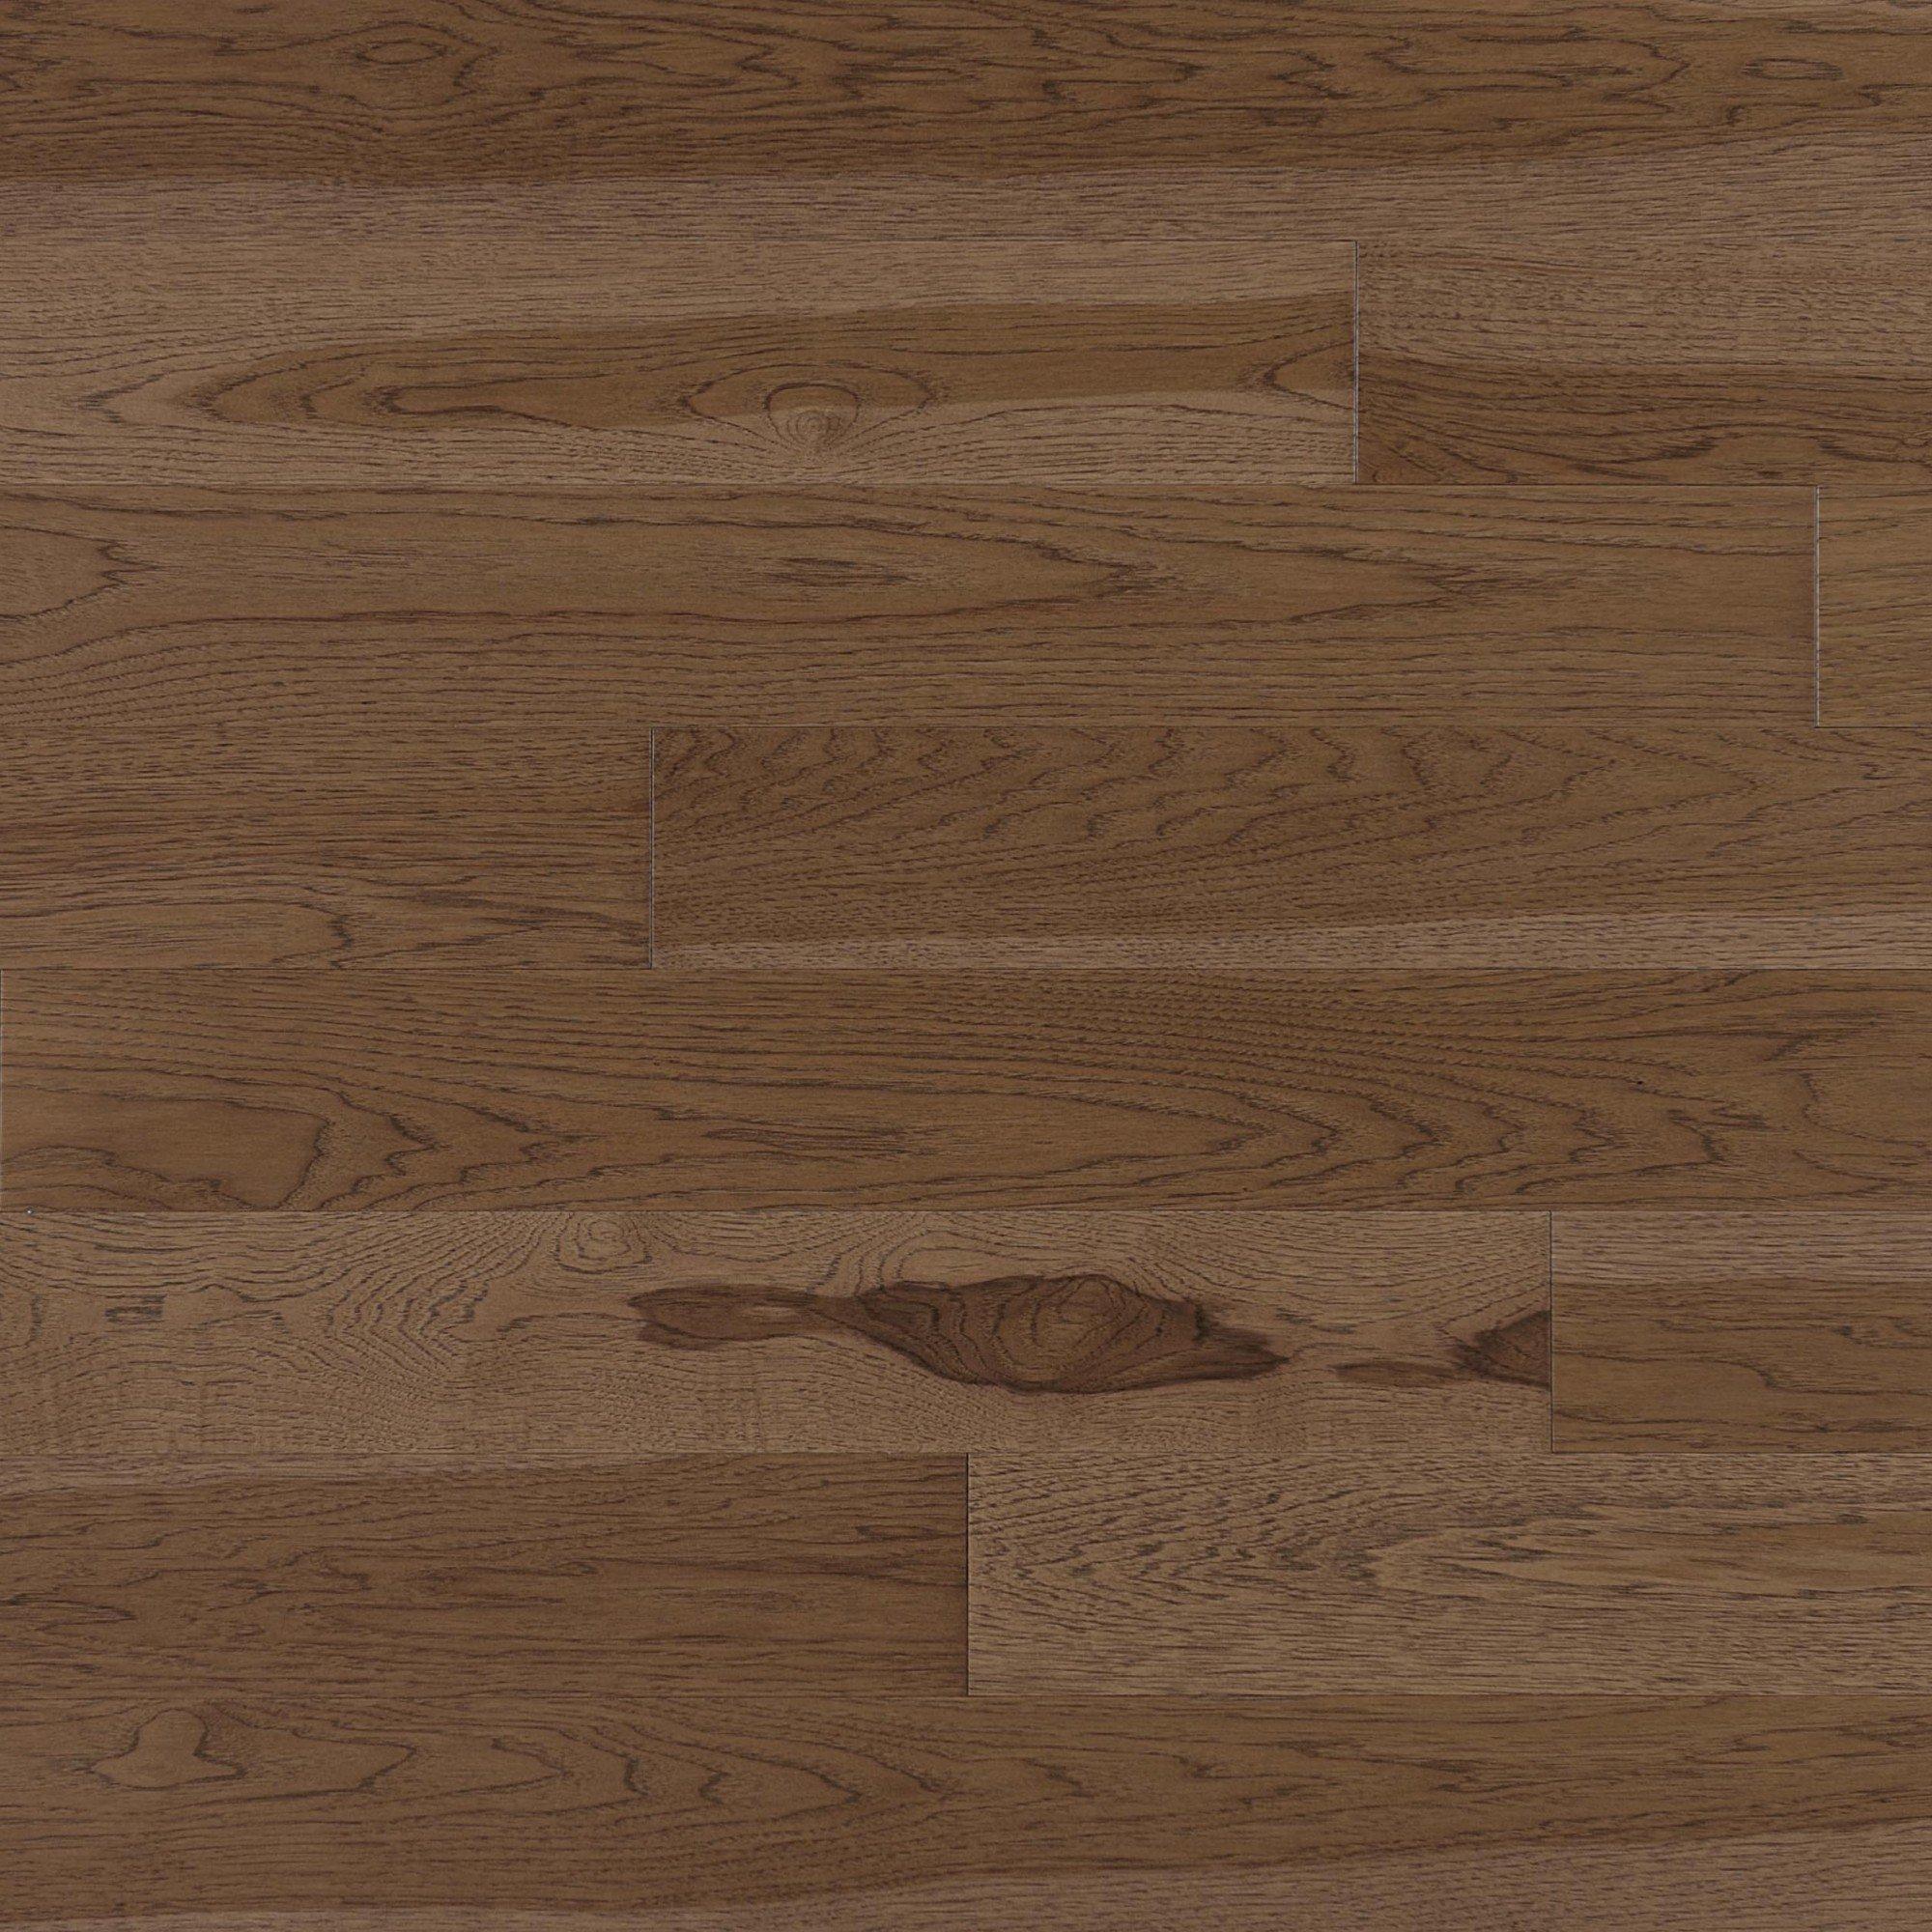 Hickory Savanna - Floor image